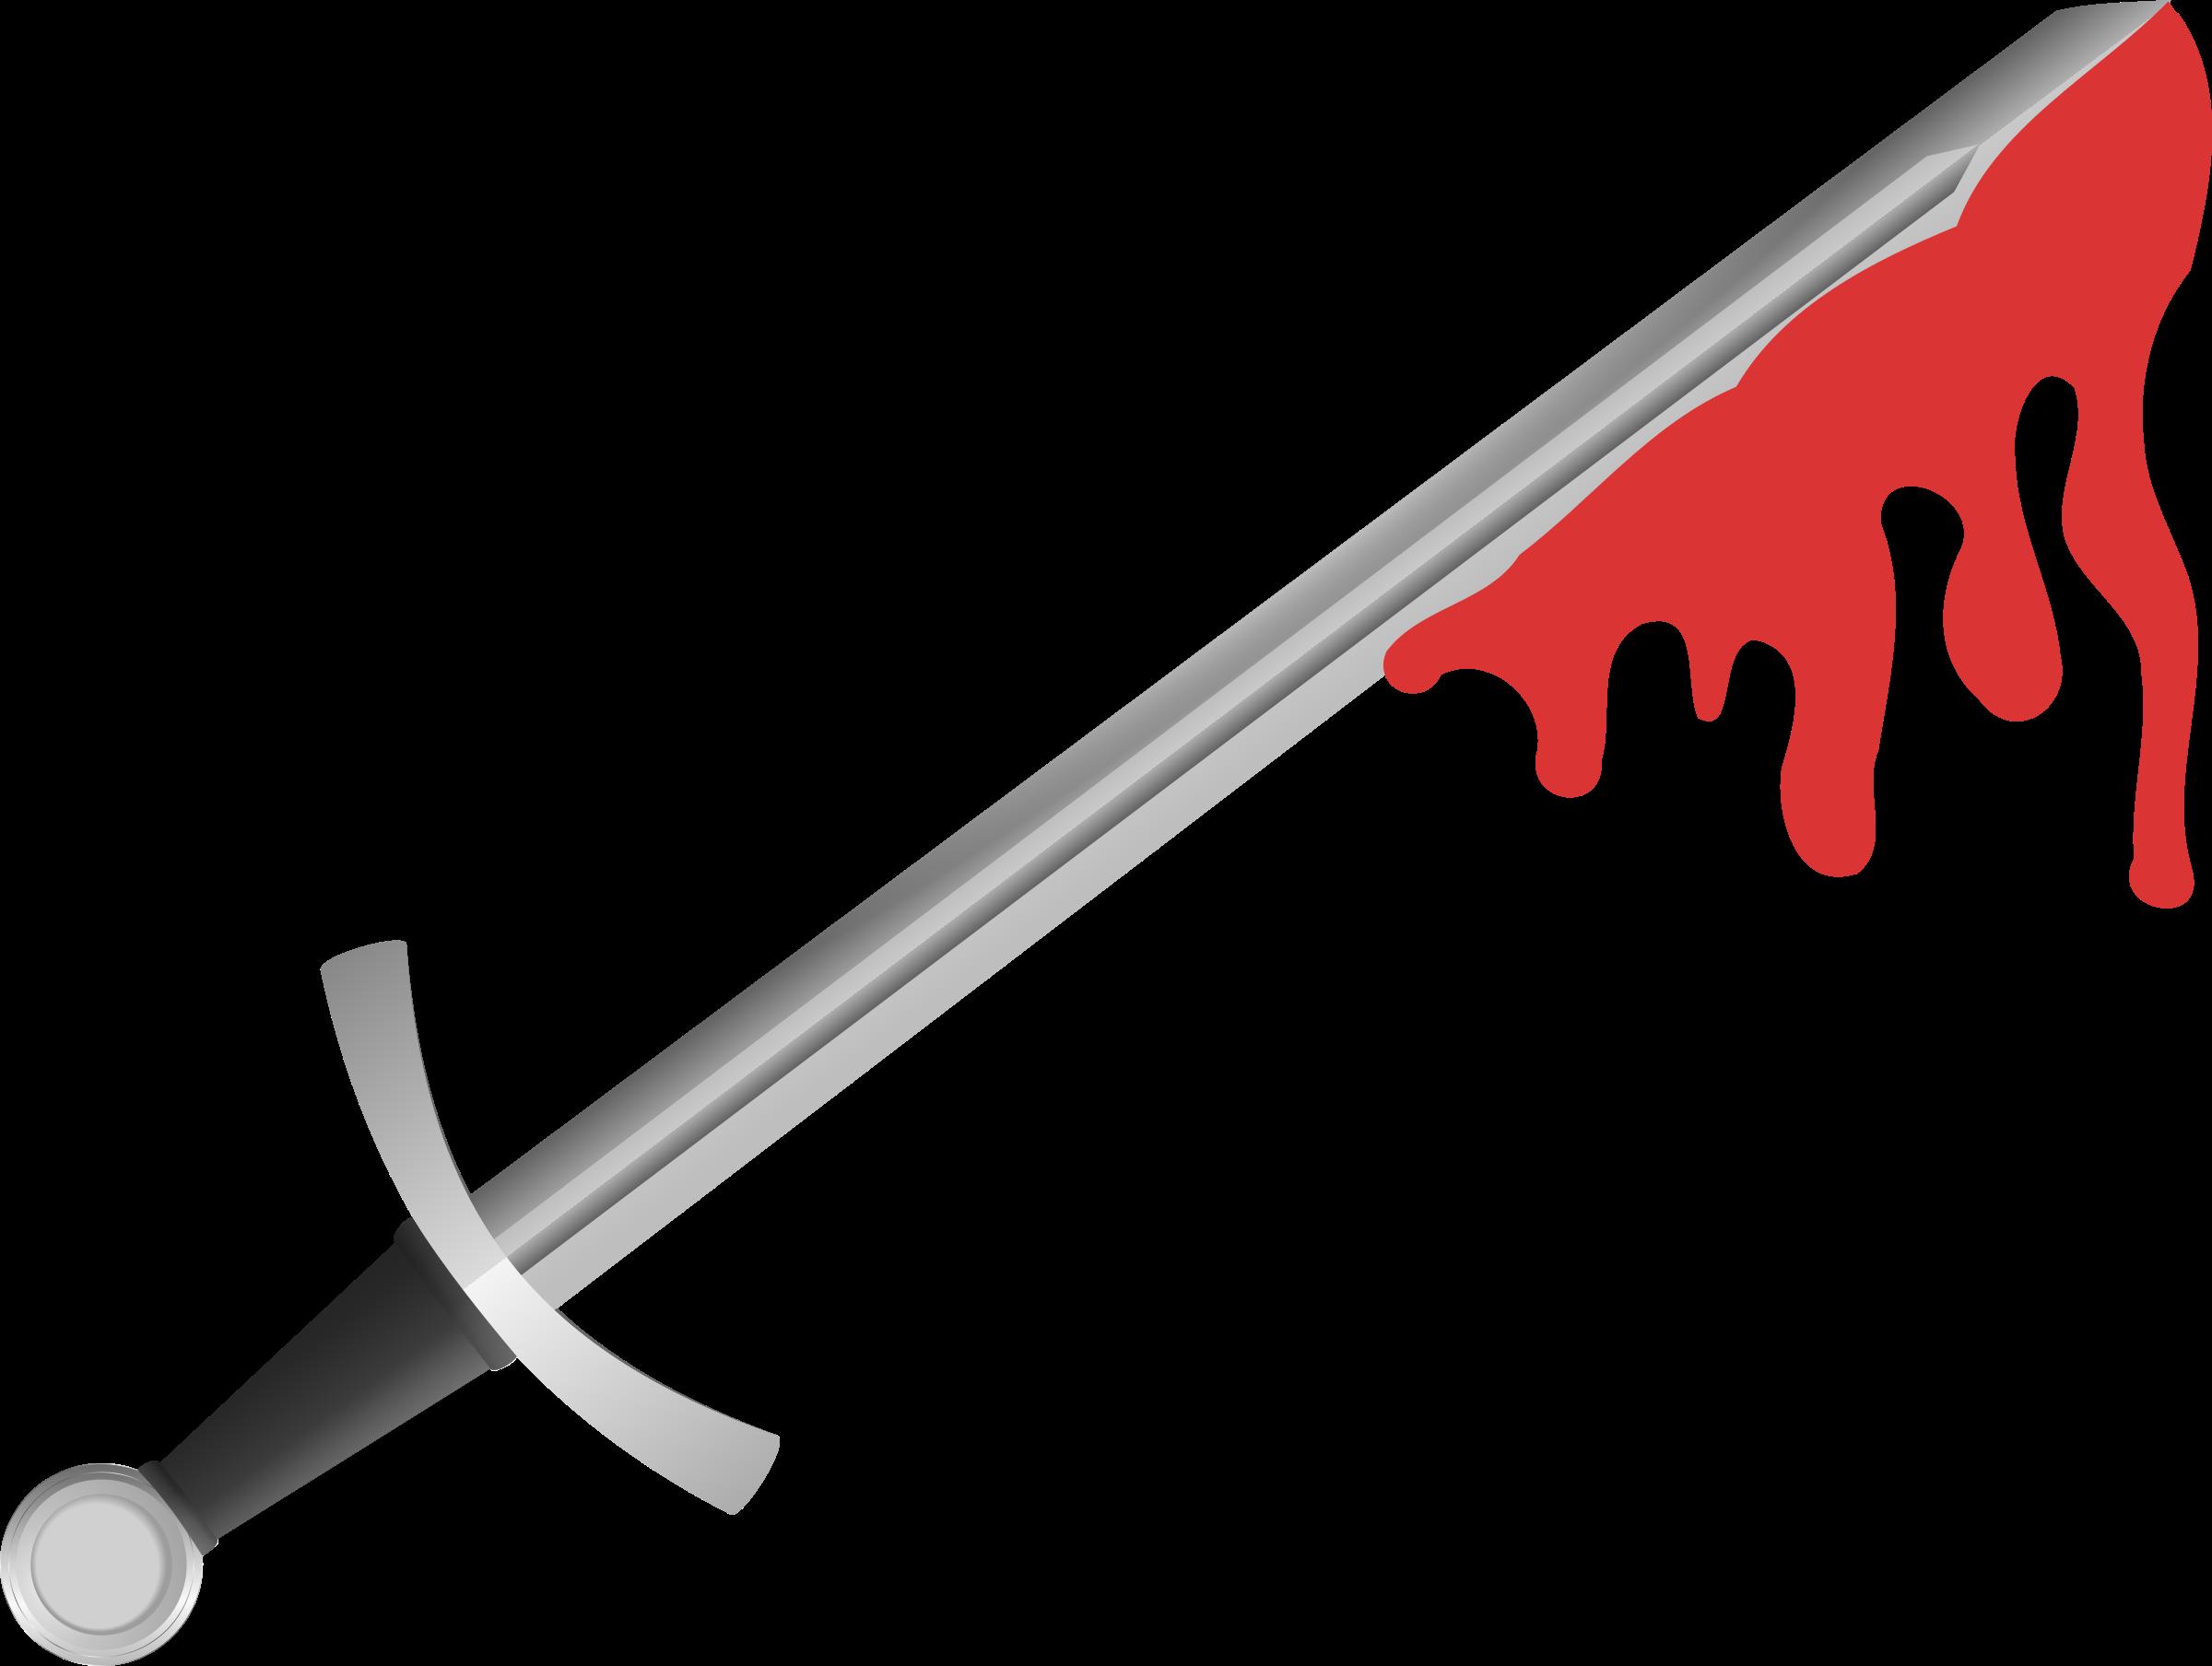 Bloody big image png. Clipart sword original